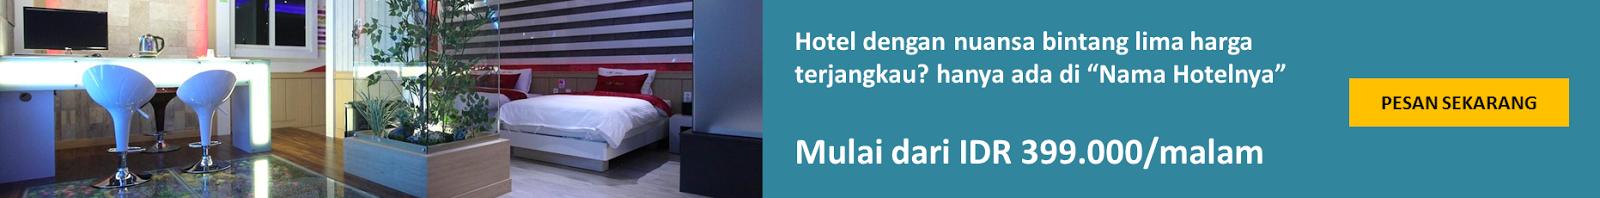 Distributor Geotextile Nusantara